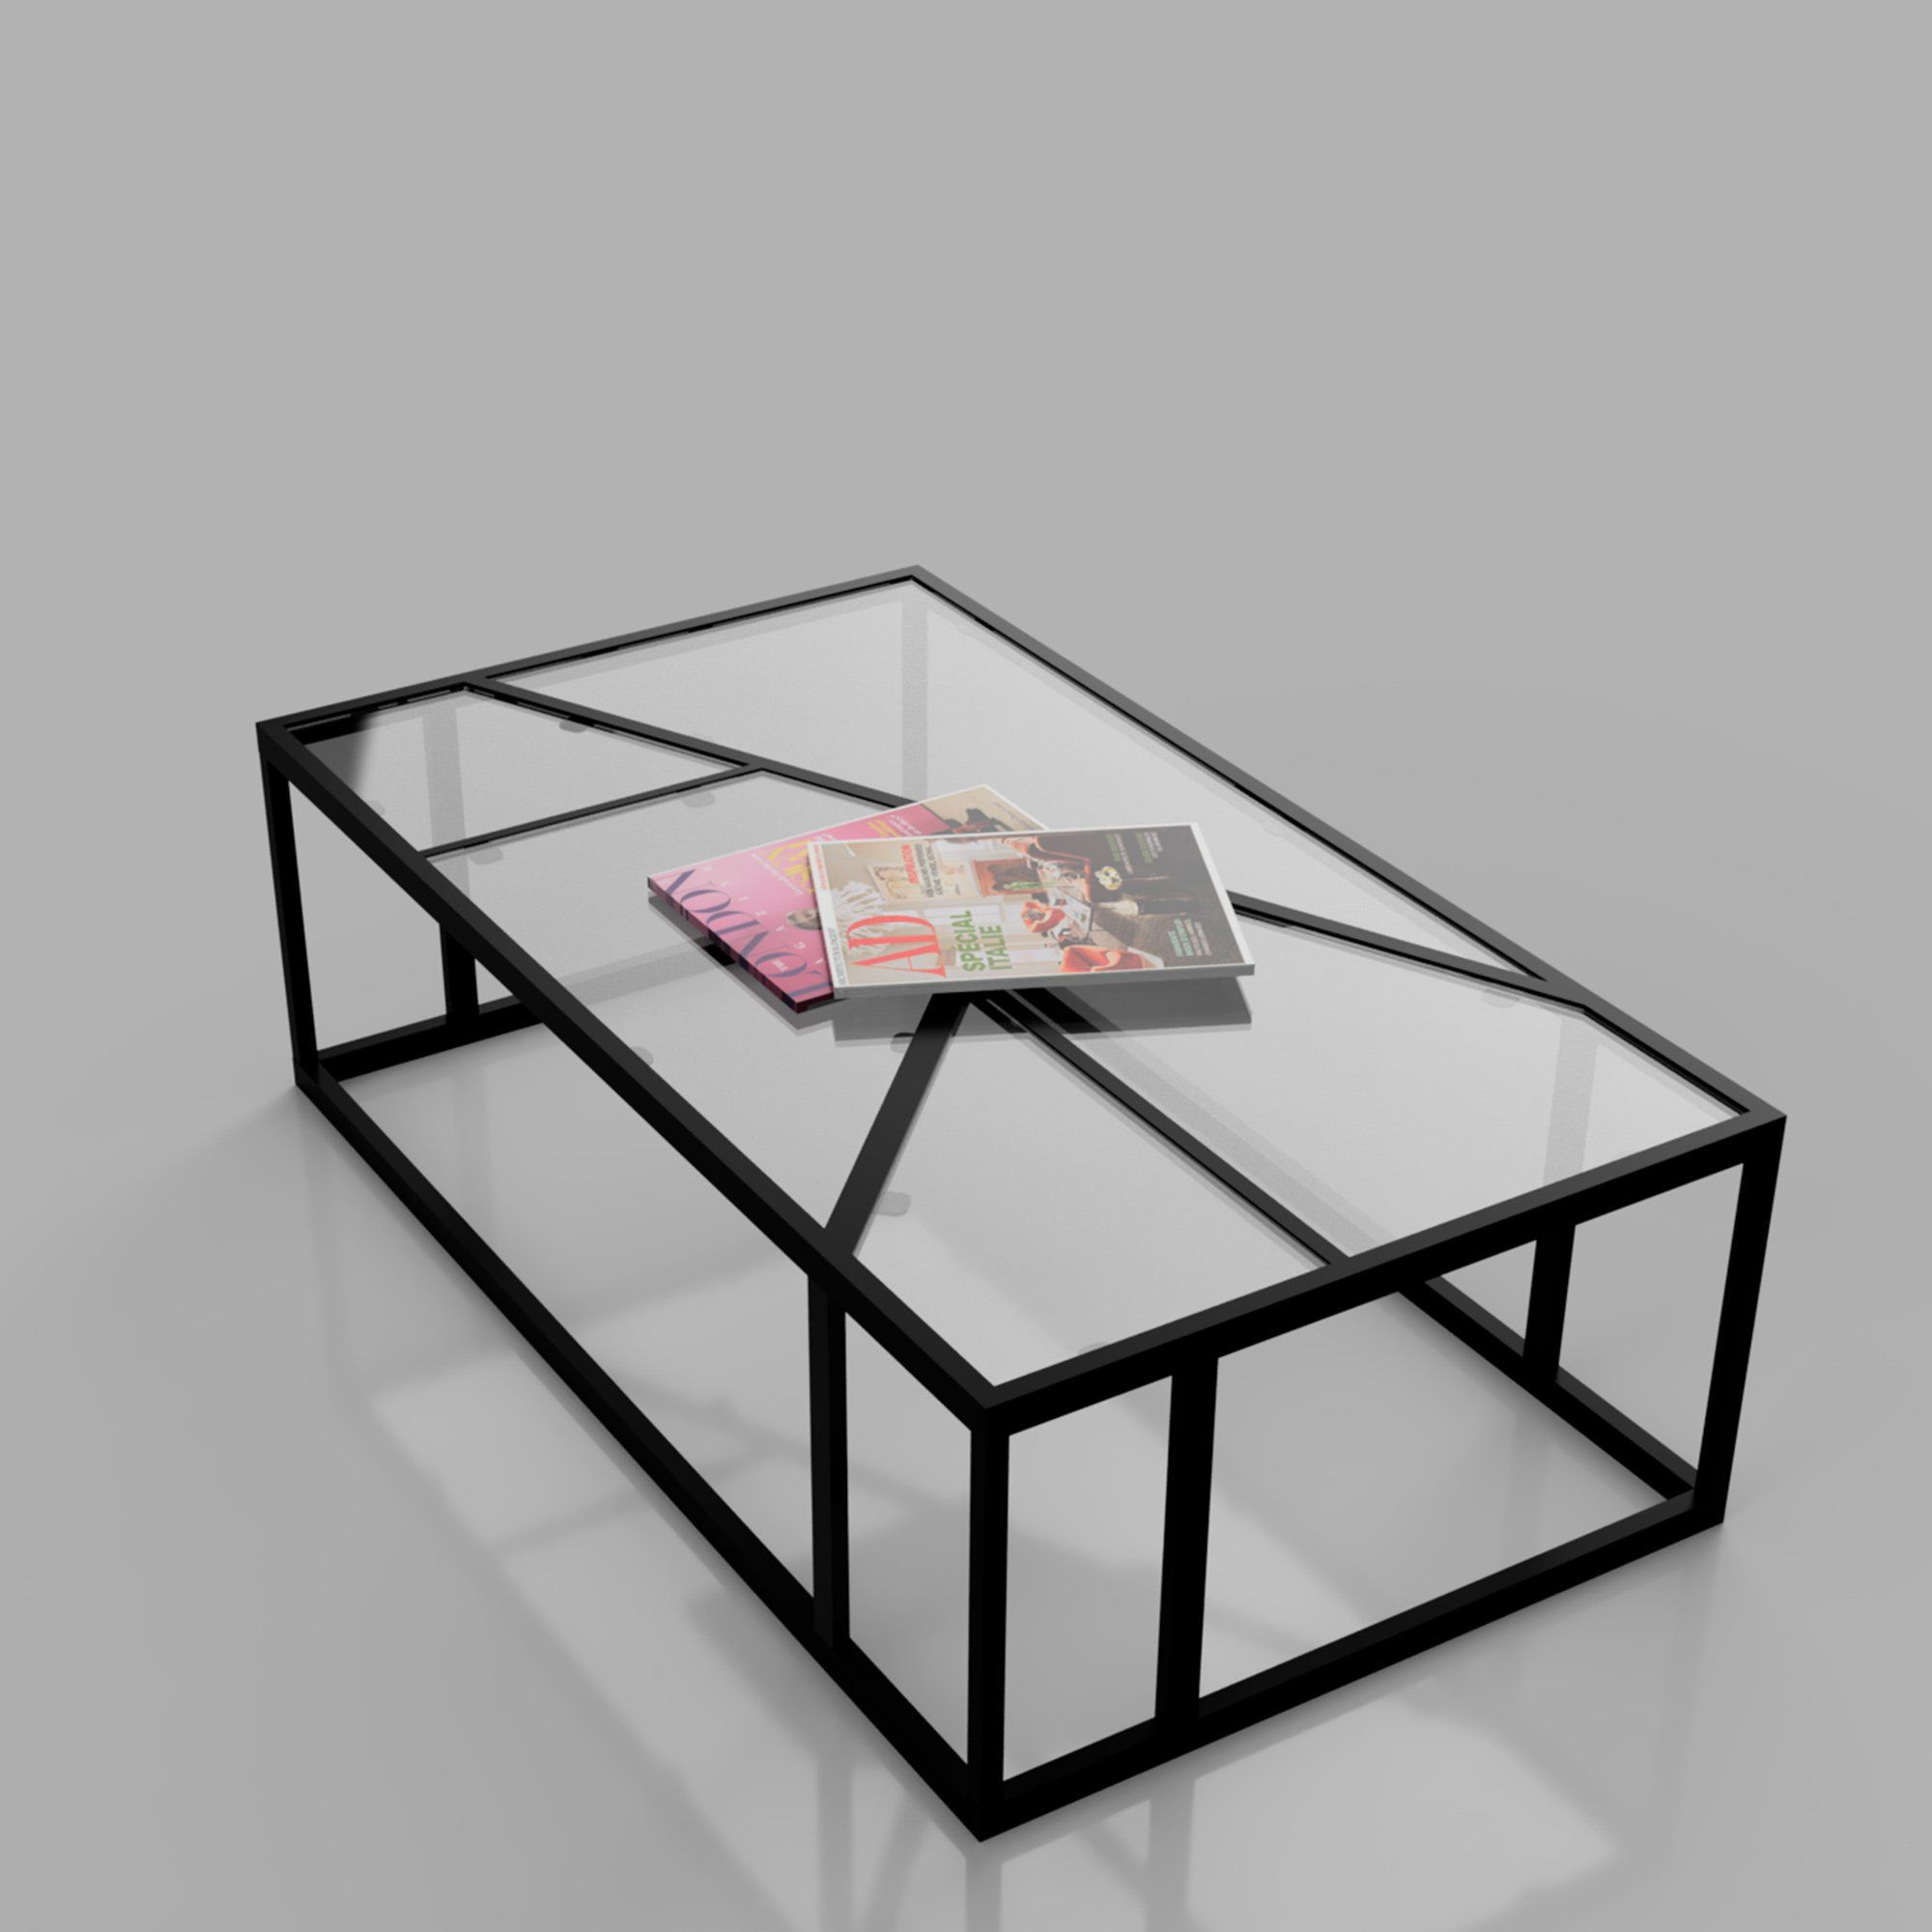 Shop Metal Frame Industrial Coffee Table Online In India Industrial Coffee Table Coffee Table Industrial Coffee [ 2000 x 2000 Pixel ]